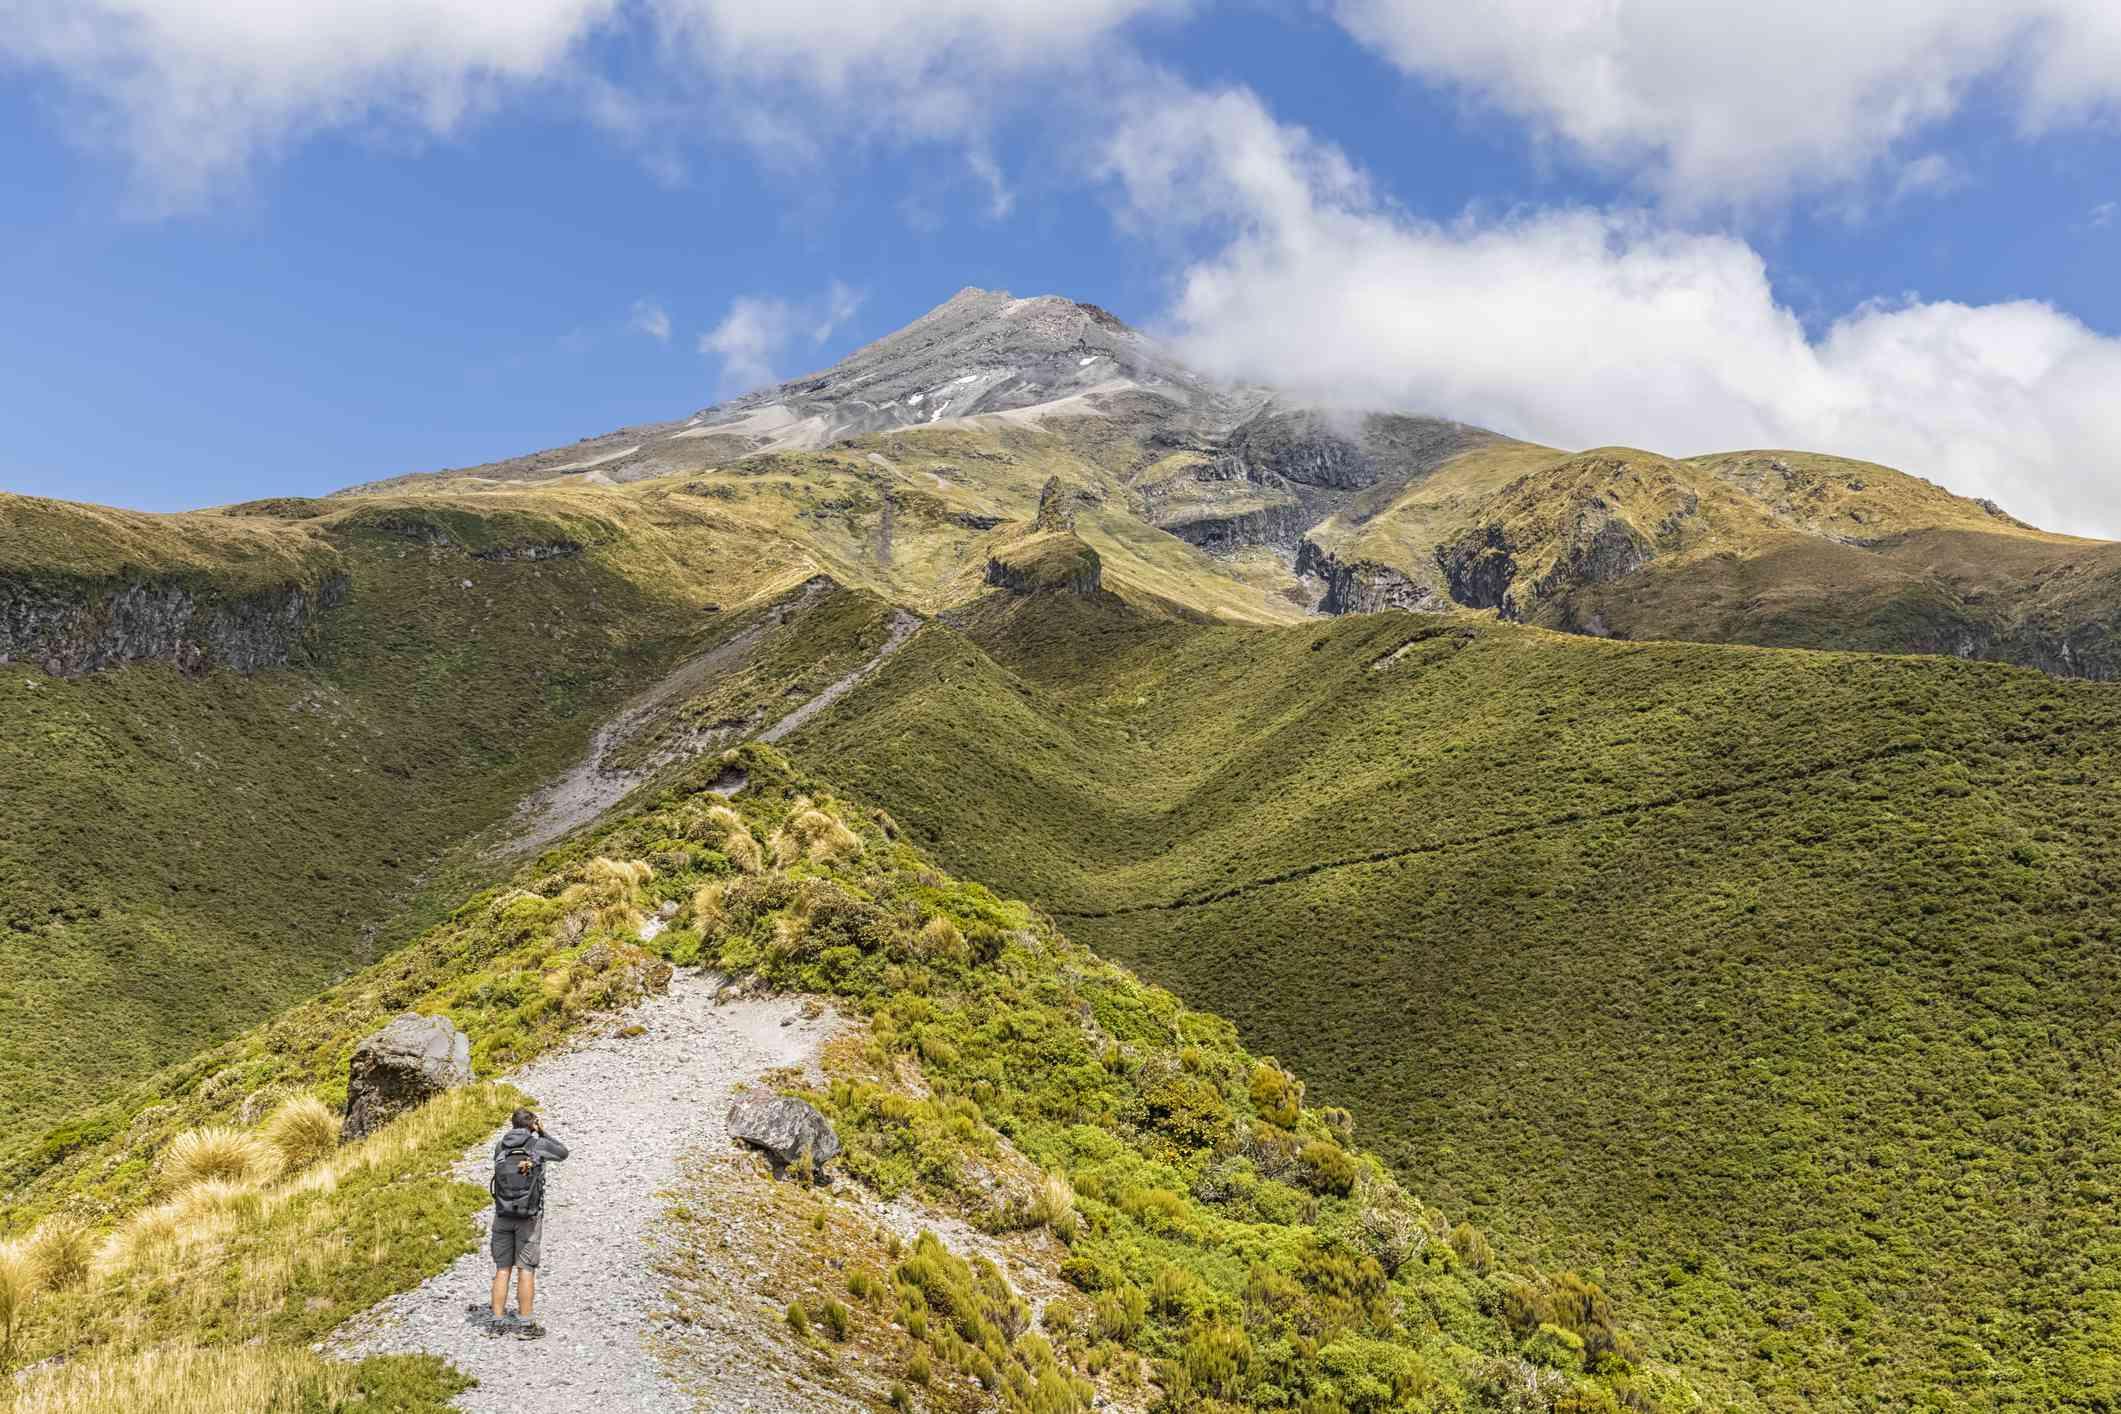 New Zealand, Male hiker admiring scenic view of Mount Taranaki volcano in spring